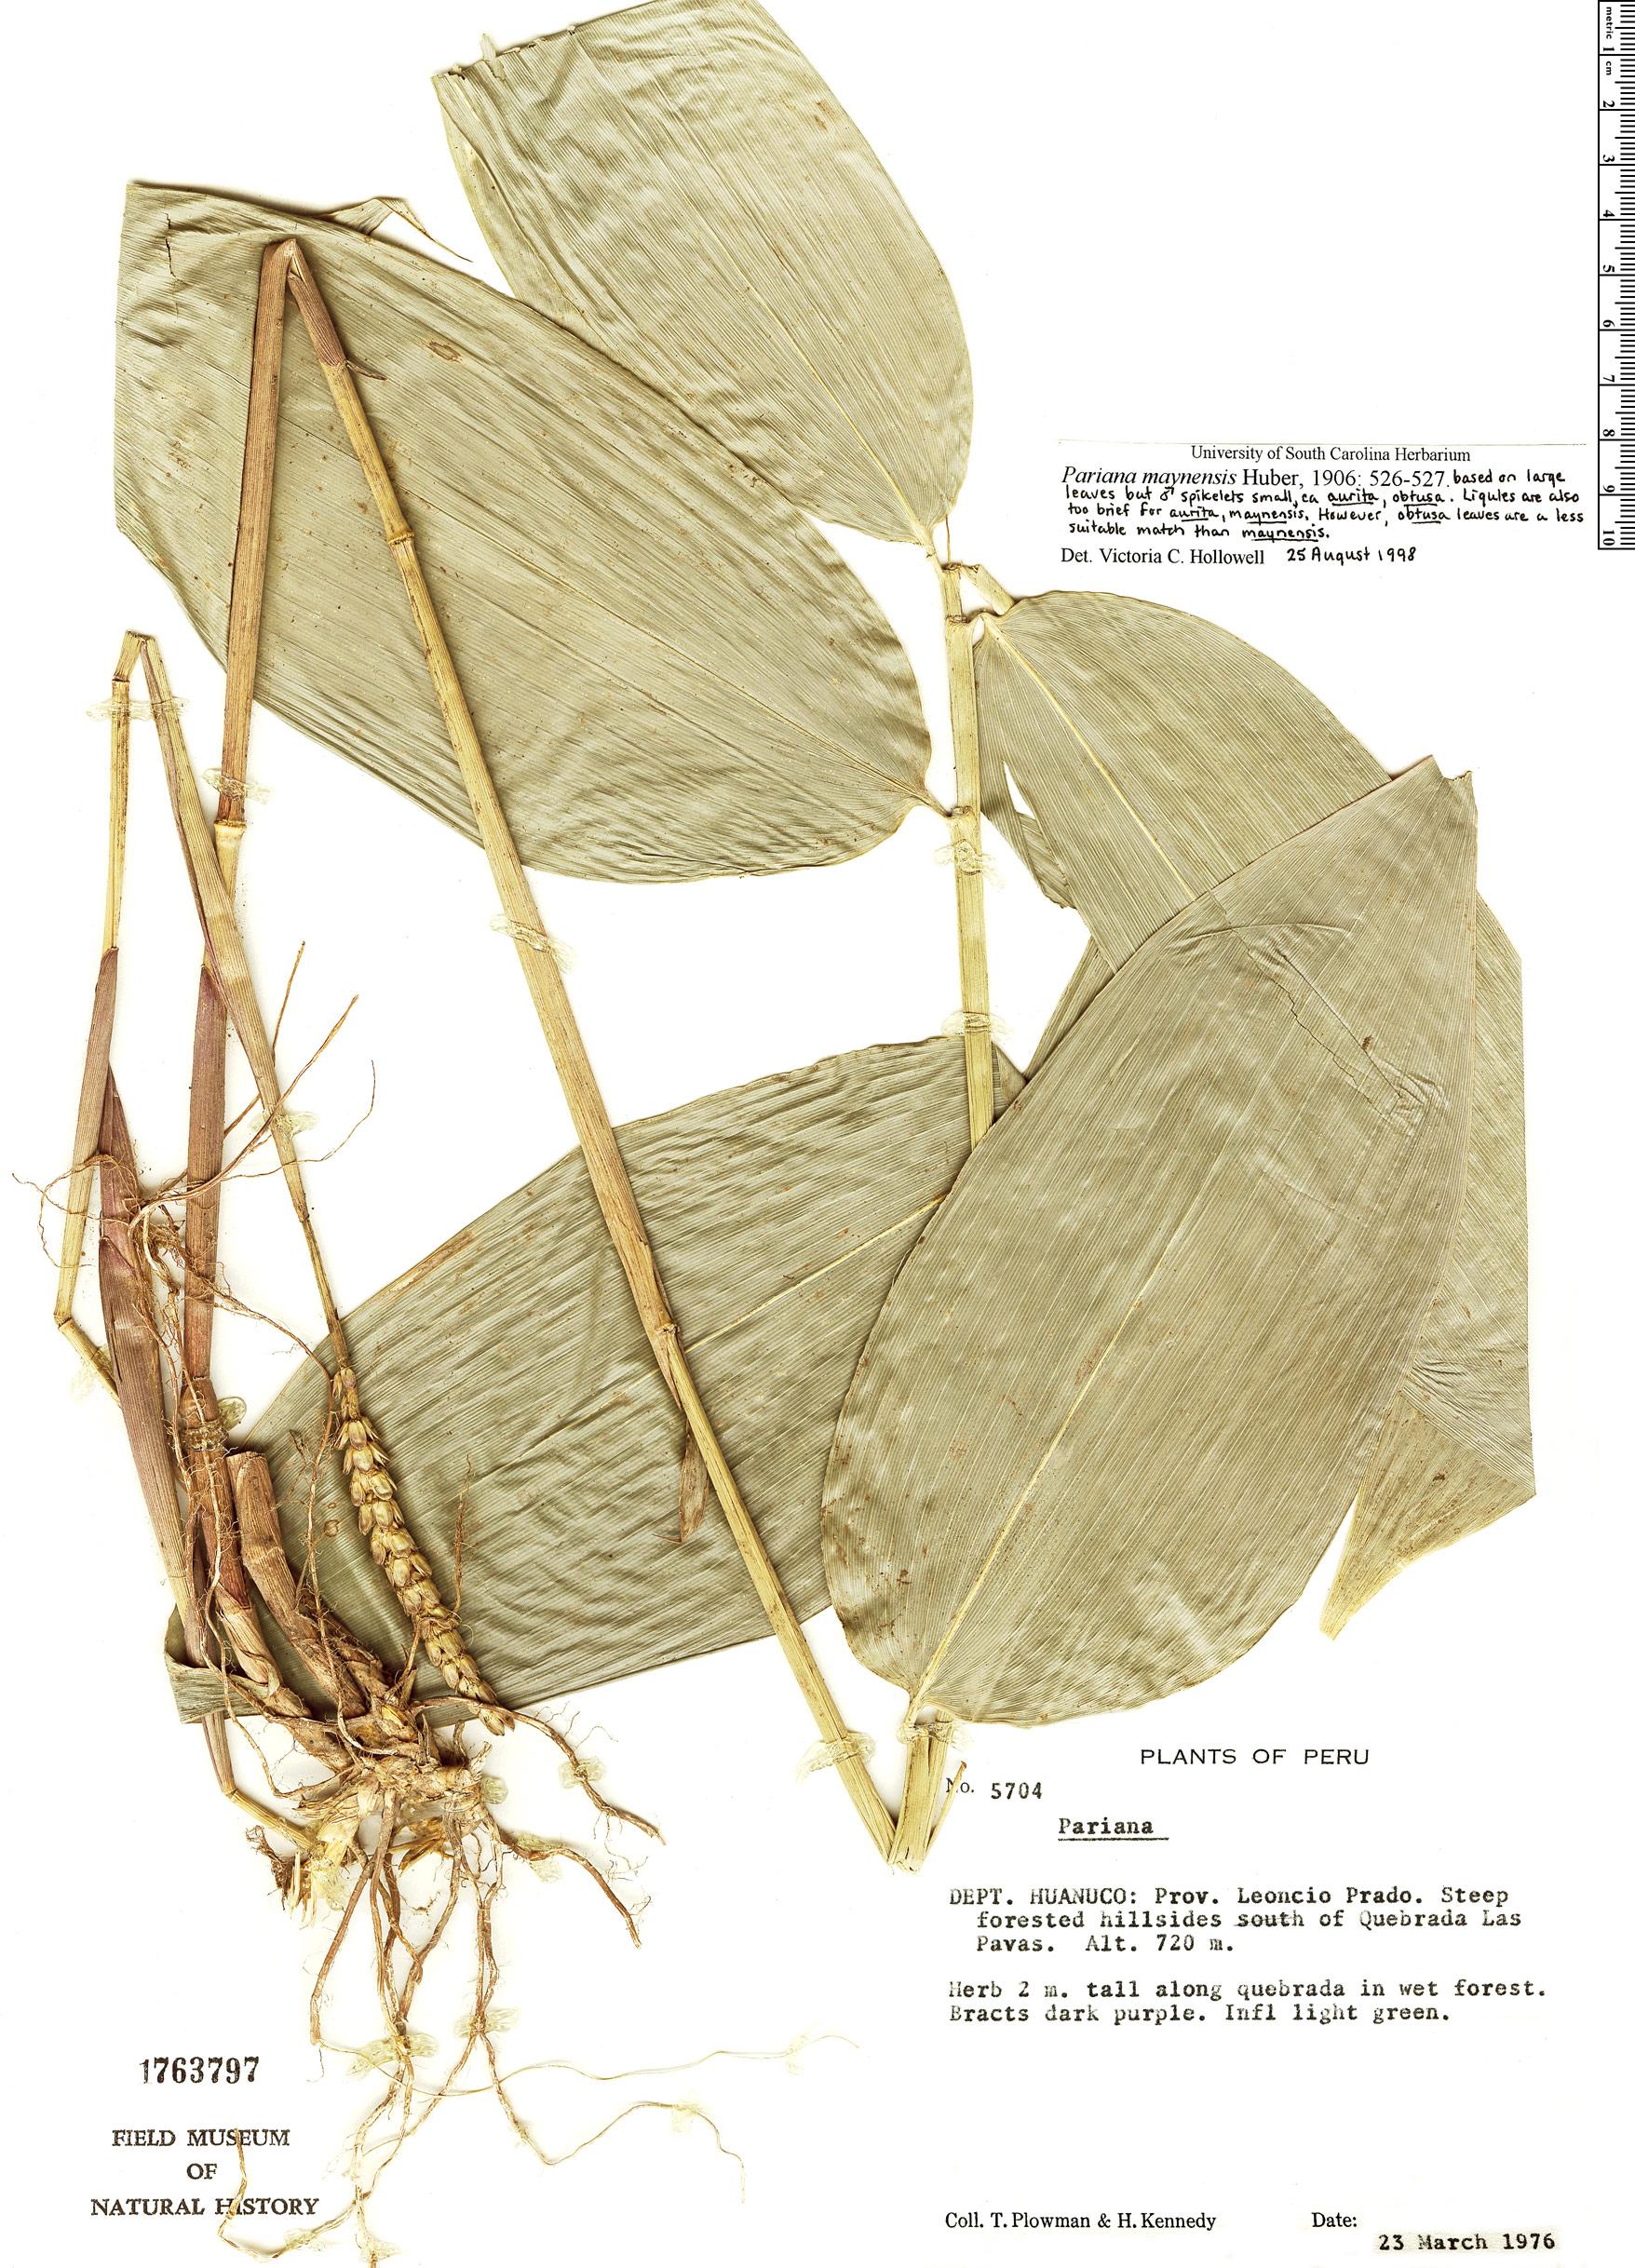 Specimen: Pariana maynensis